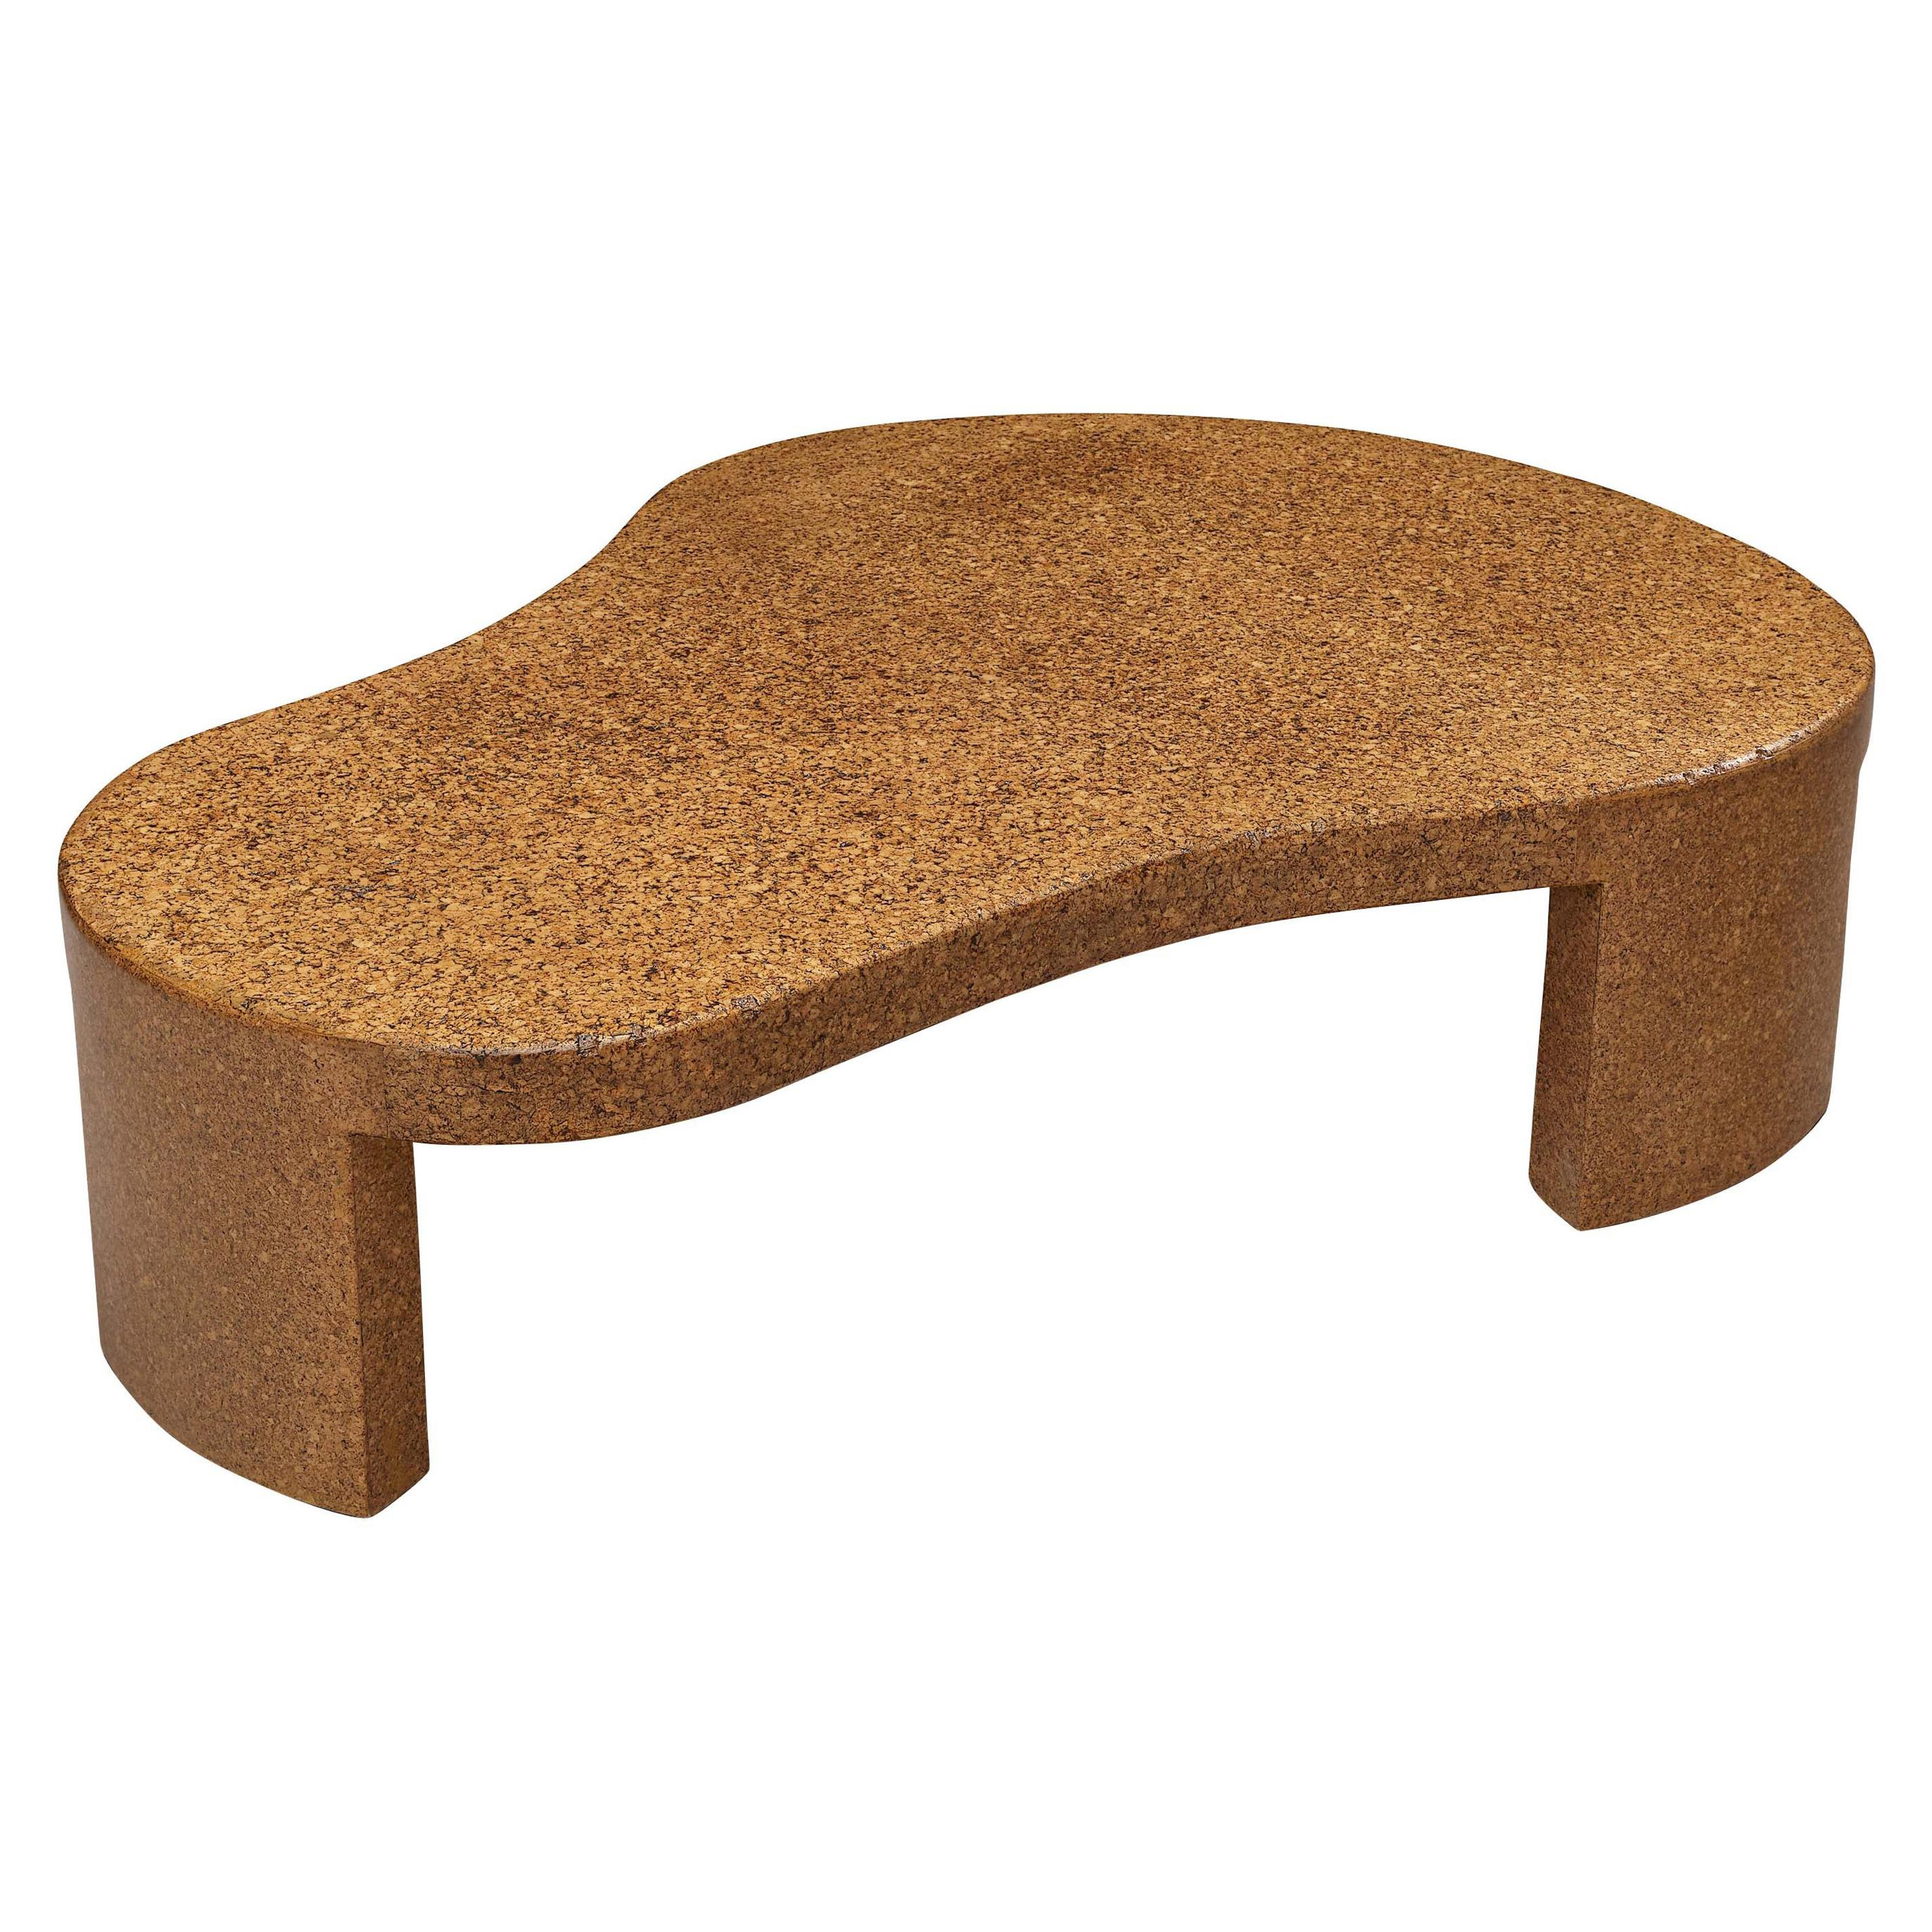 Rare Paul Frankl Freeform Coffee Table Model 5025 in Cork